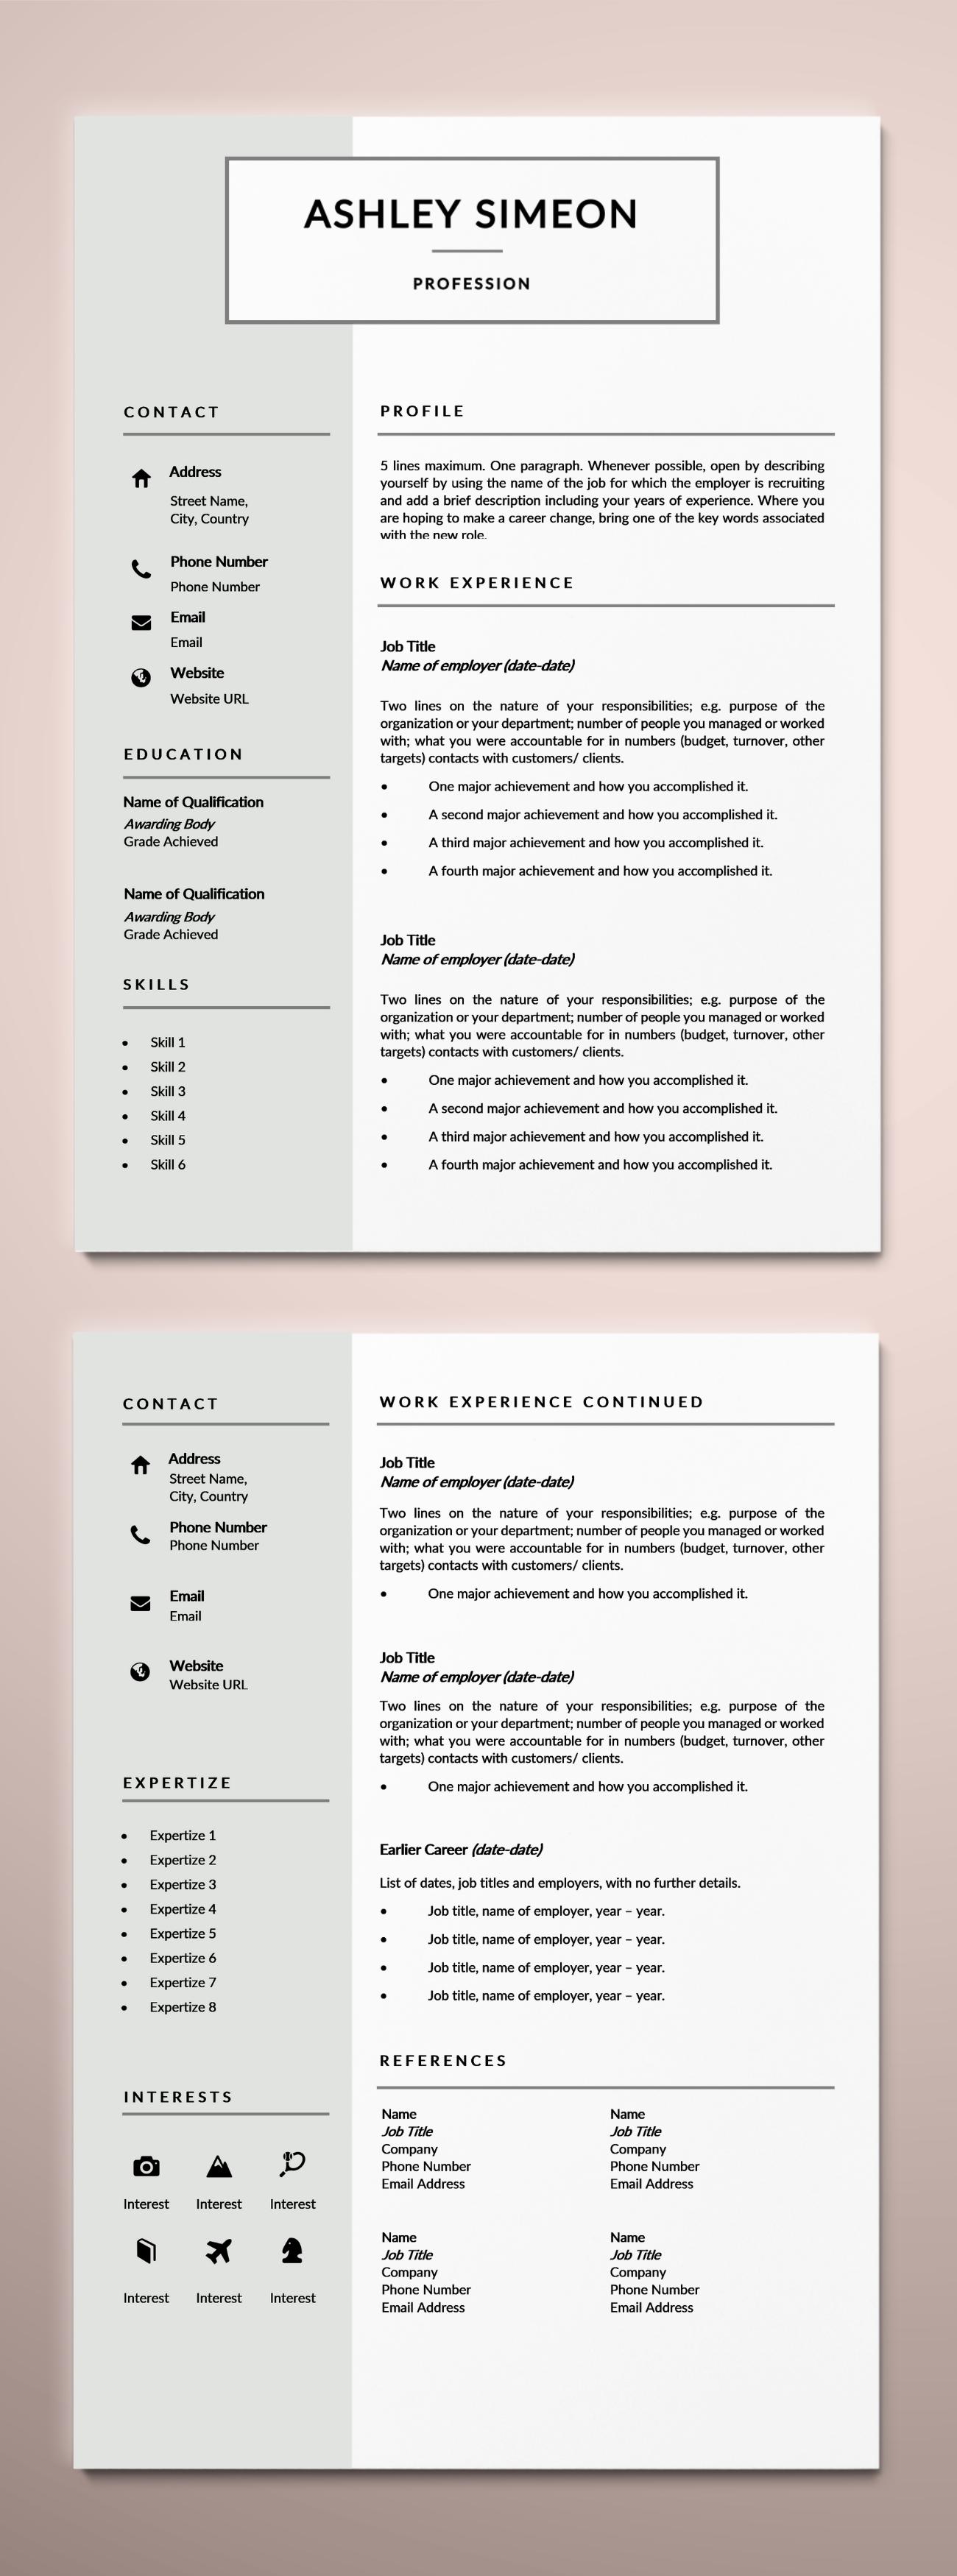 2 Page Resume Template, CV Template, Curriculum Vitae